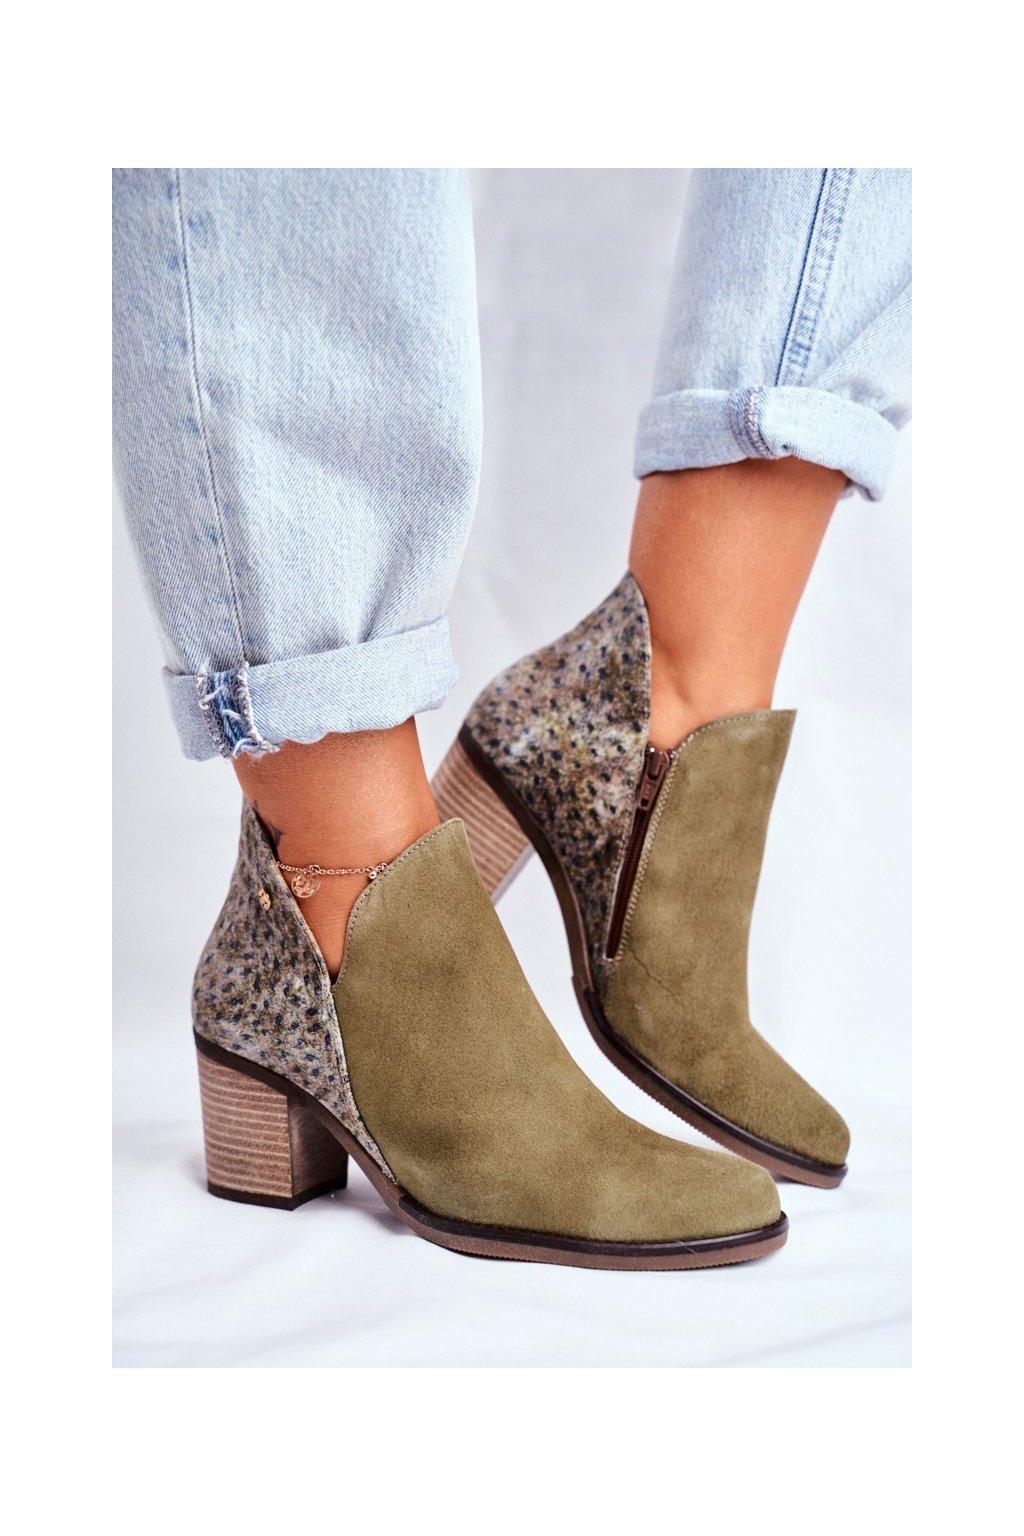 Členkové topánky na podpätku farba zelená kód obuvi 04492-24/00-5 OLIWKA